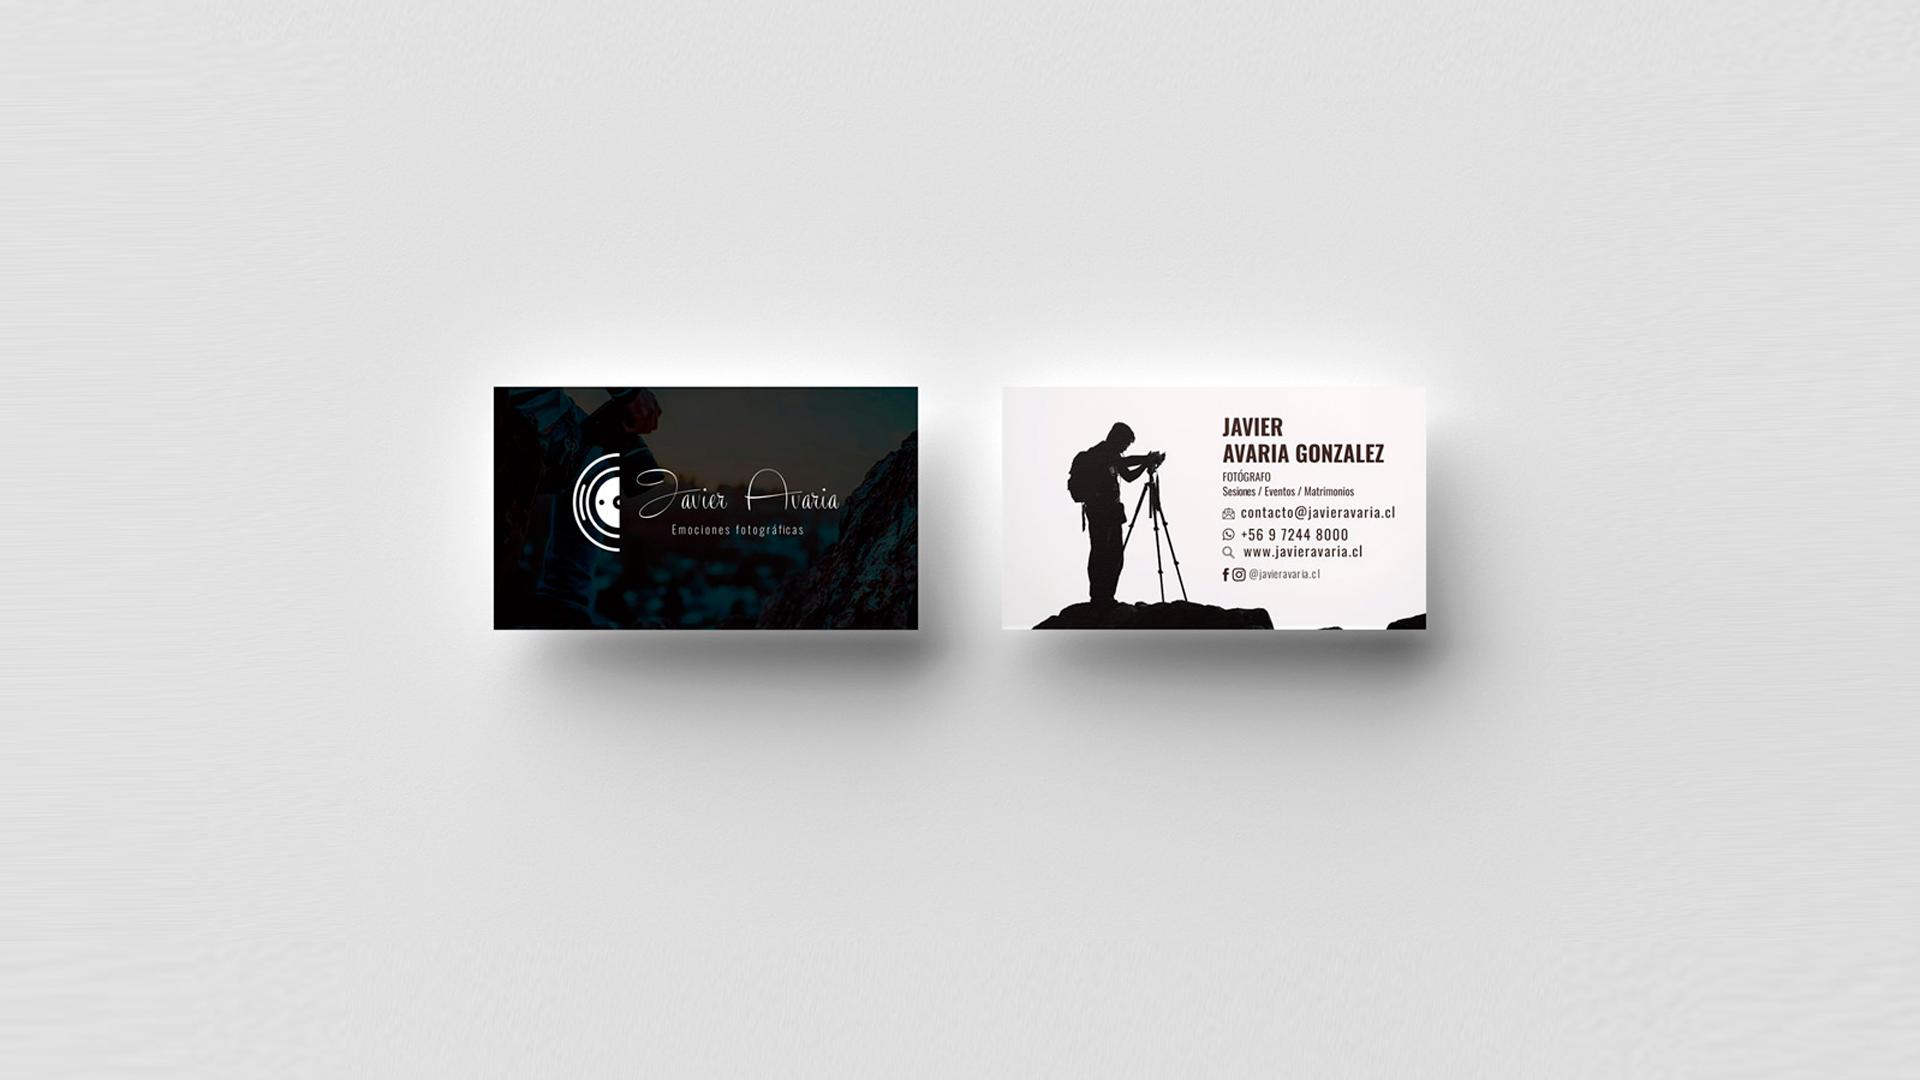 javier-avaria-proyecto-tarjetas